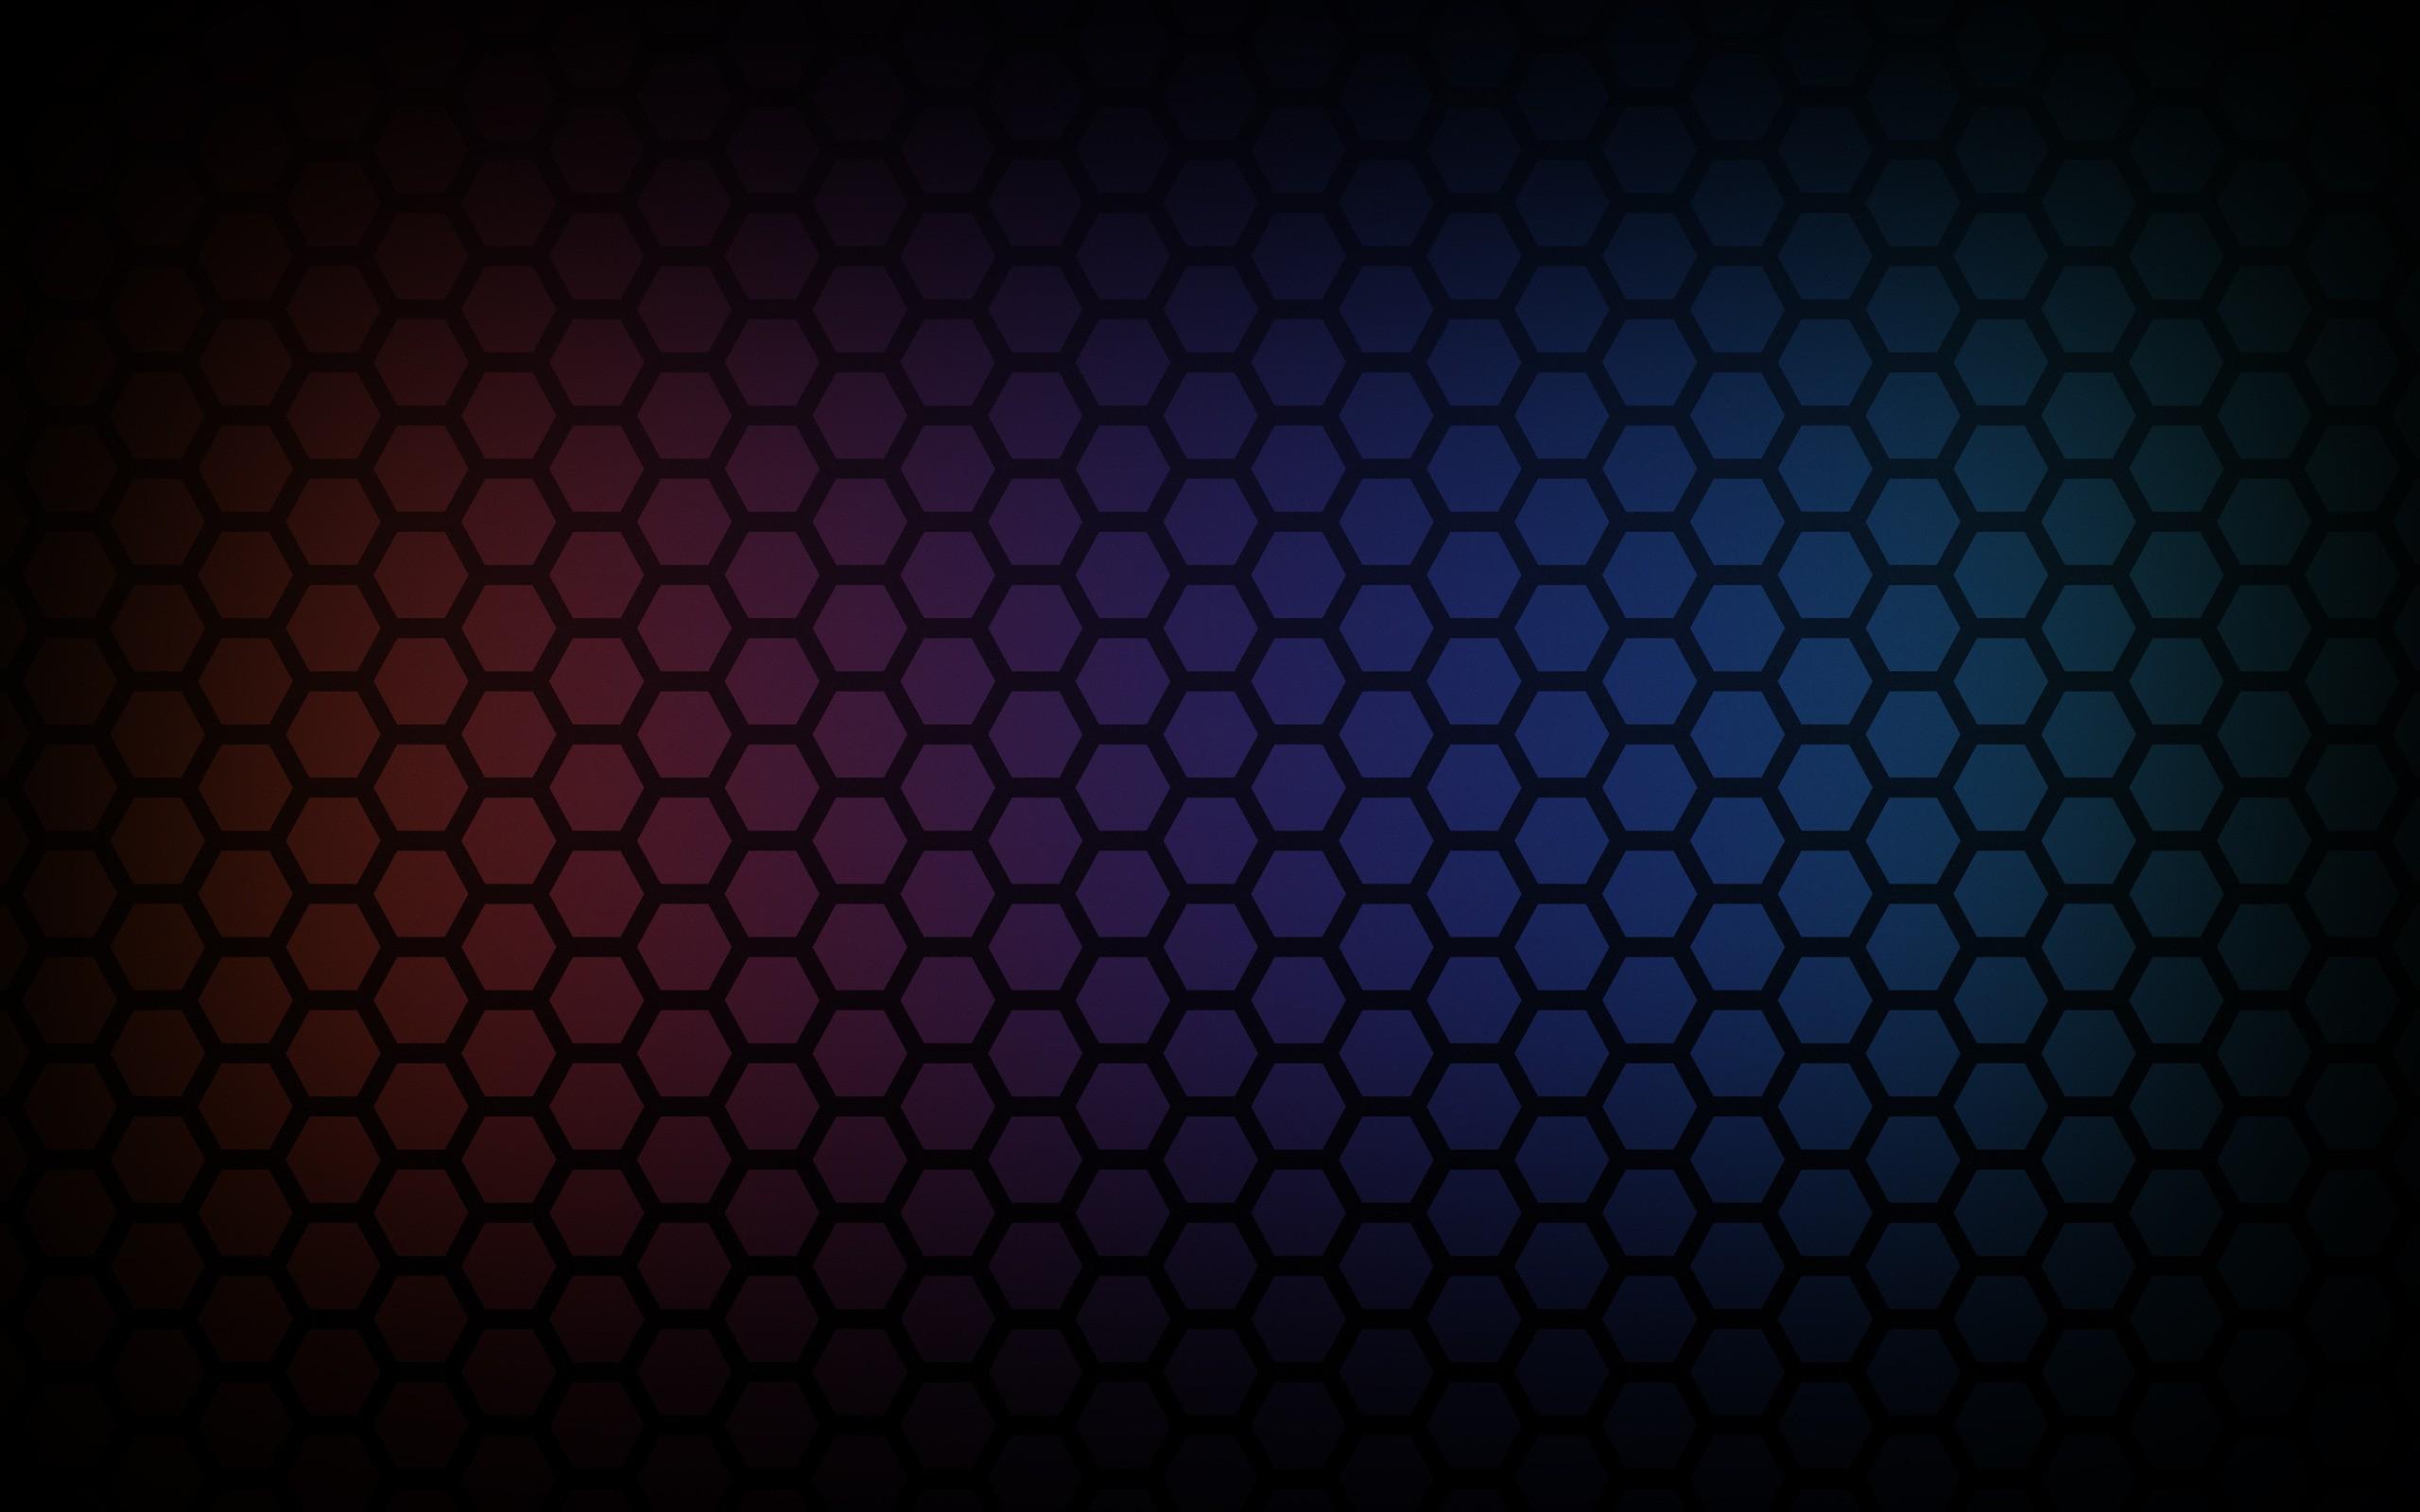 General 2560x1600 hexagon colorful pattern gradient honeycombs abstract textured texture digital art